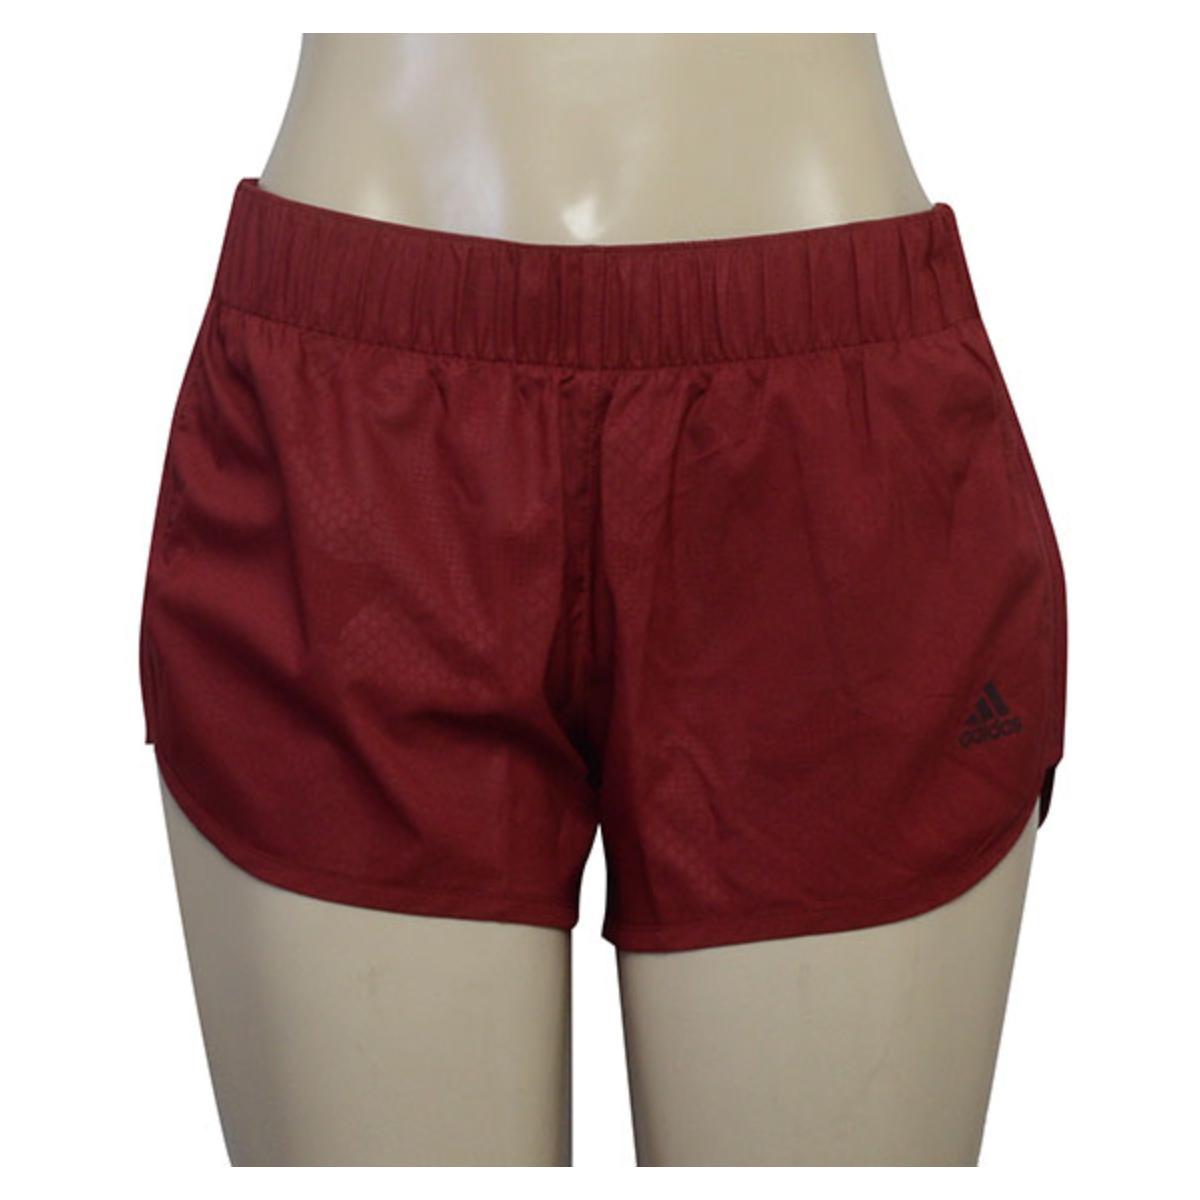 Short Feminino Adidas Dm2816 M10 Shor Vinho